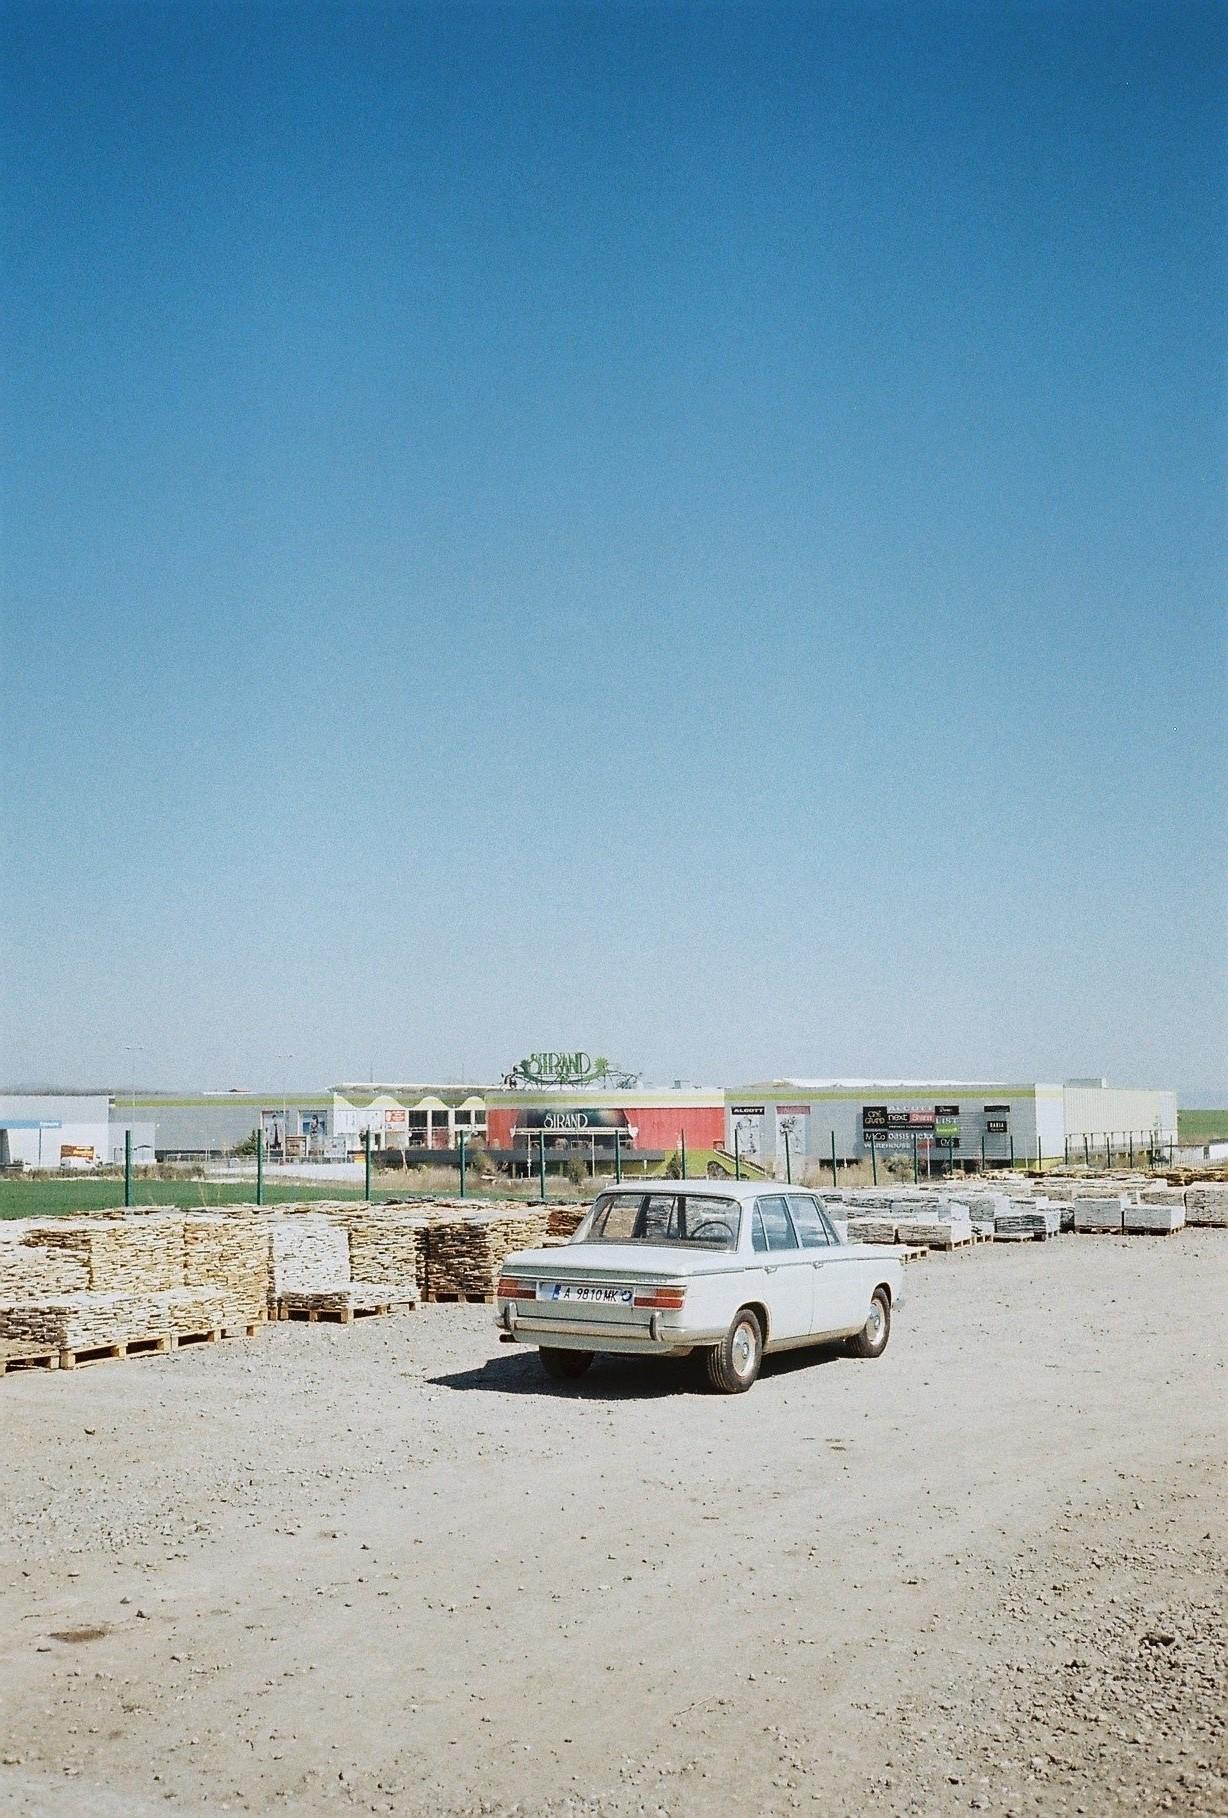 ewan-waddell-semi-zine-photography-submission-5.jpg